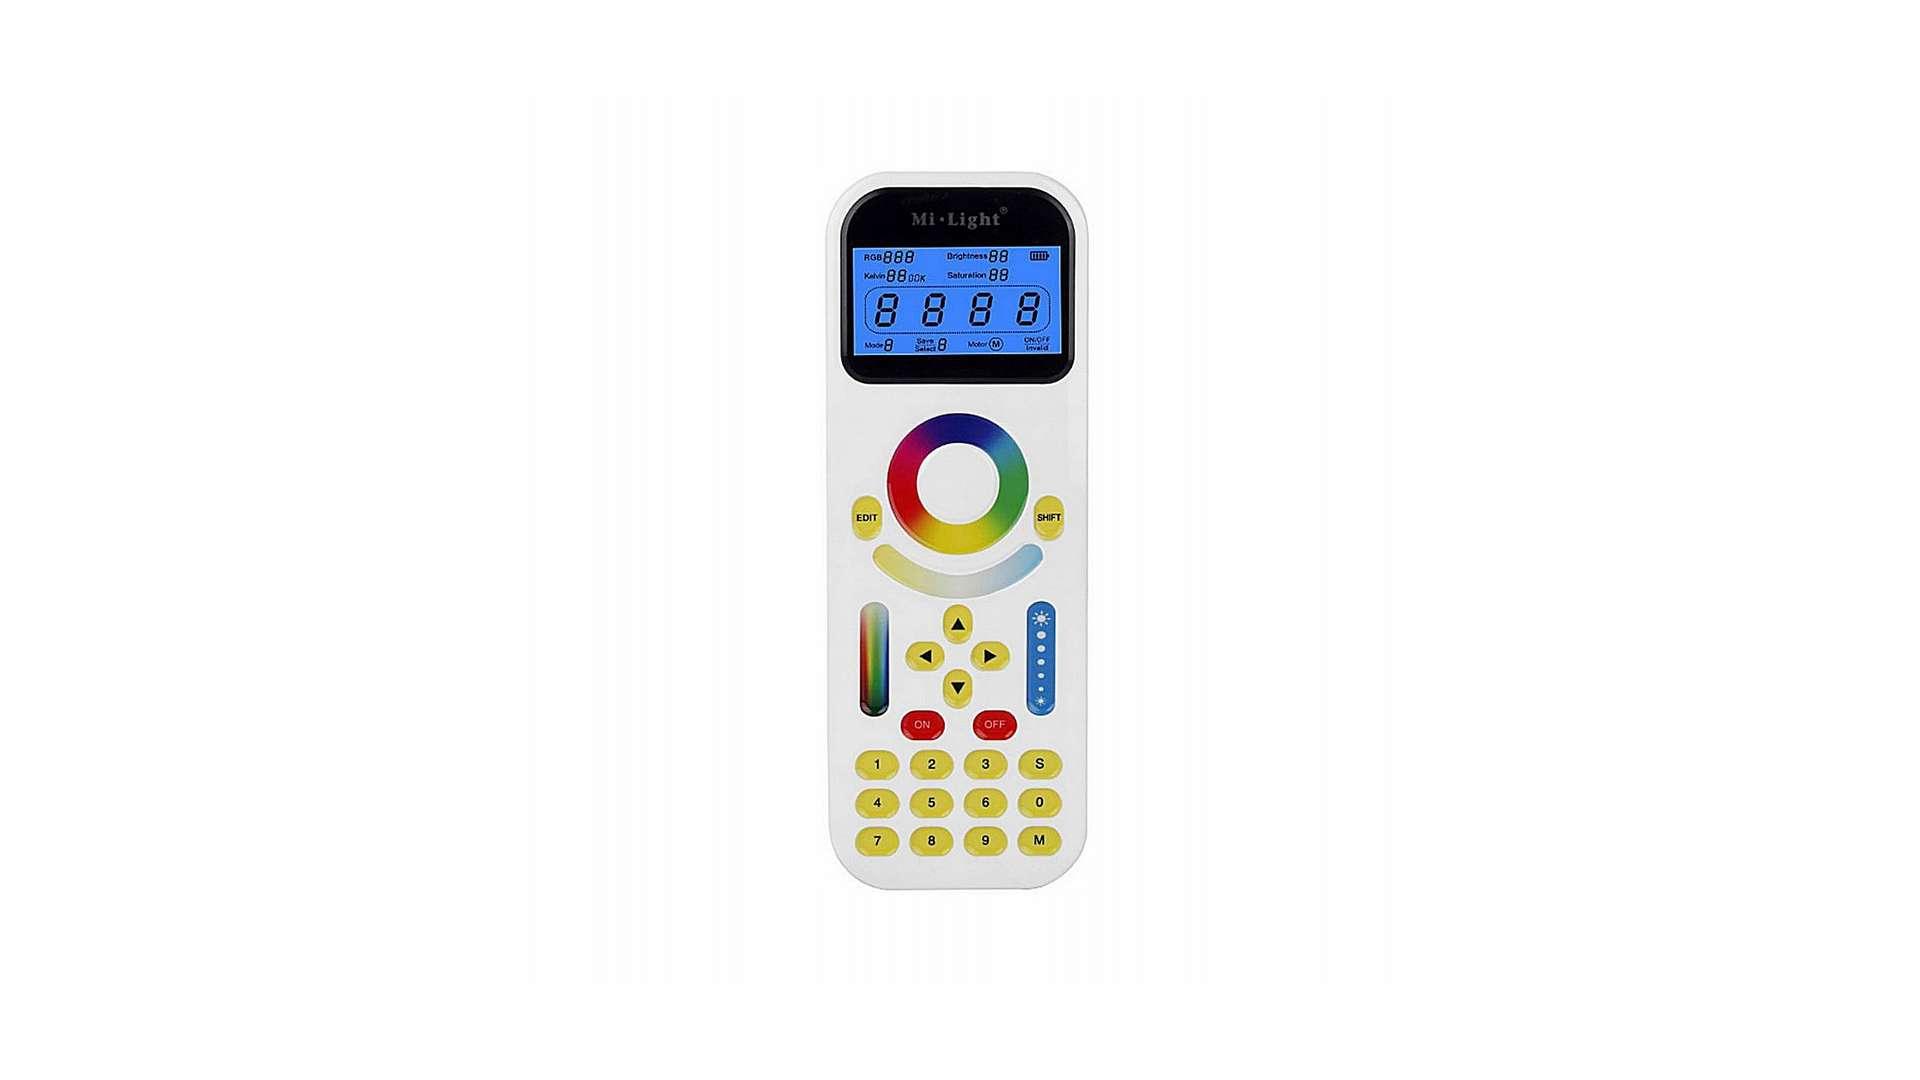 Pilot LED radiowy LCD - 99 stref - MONO /CCT /RGBW